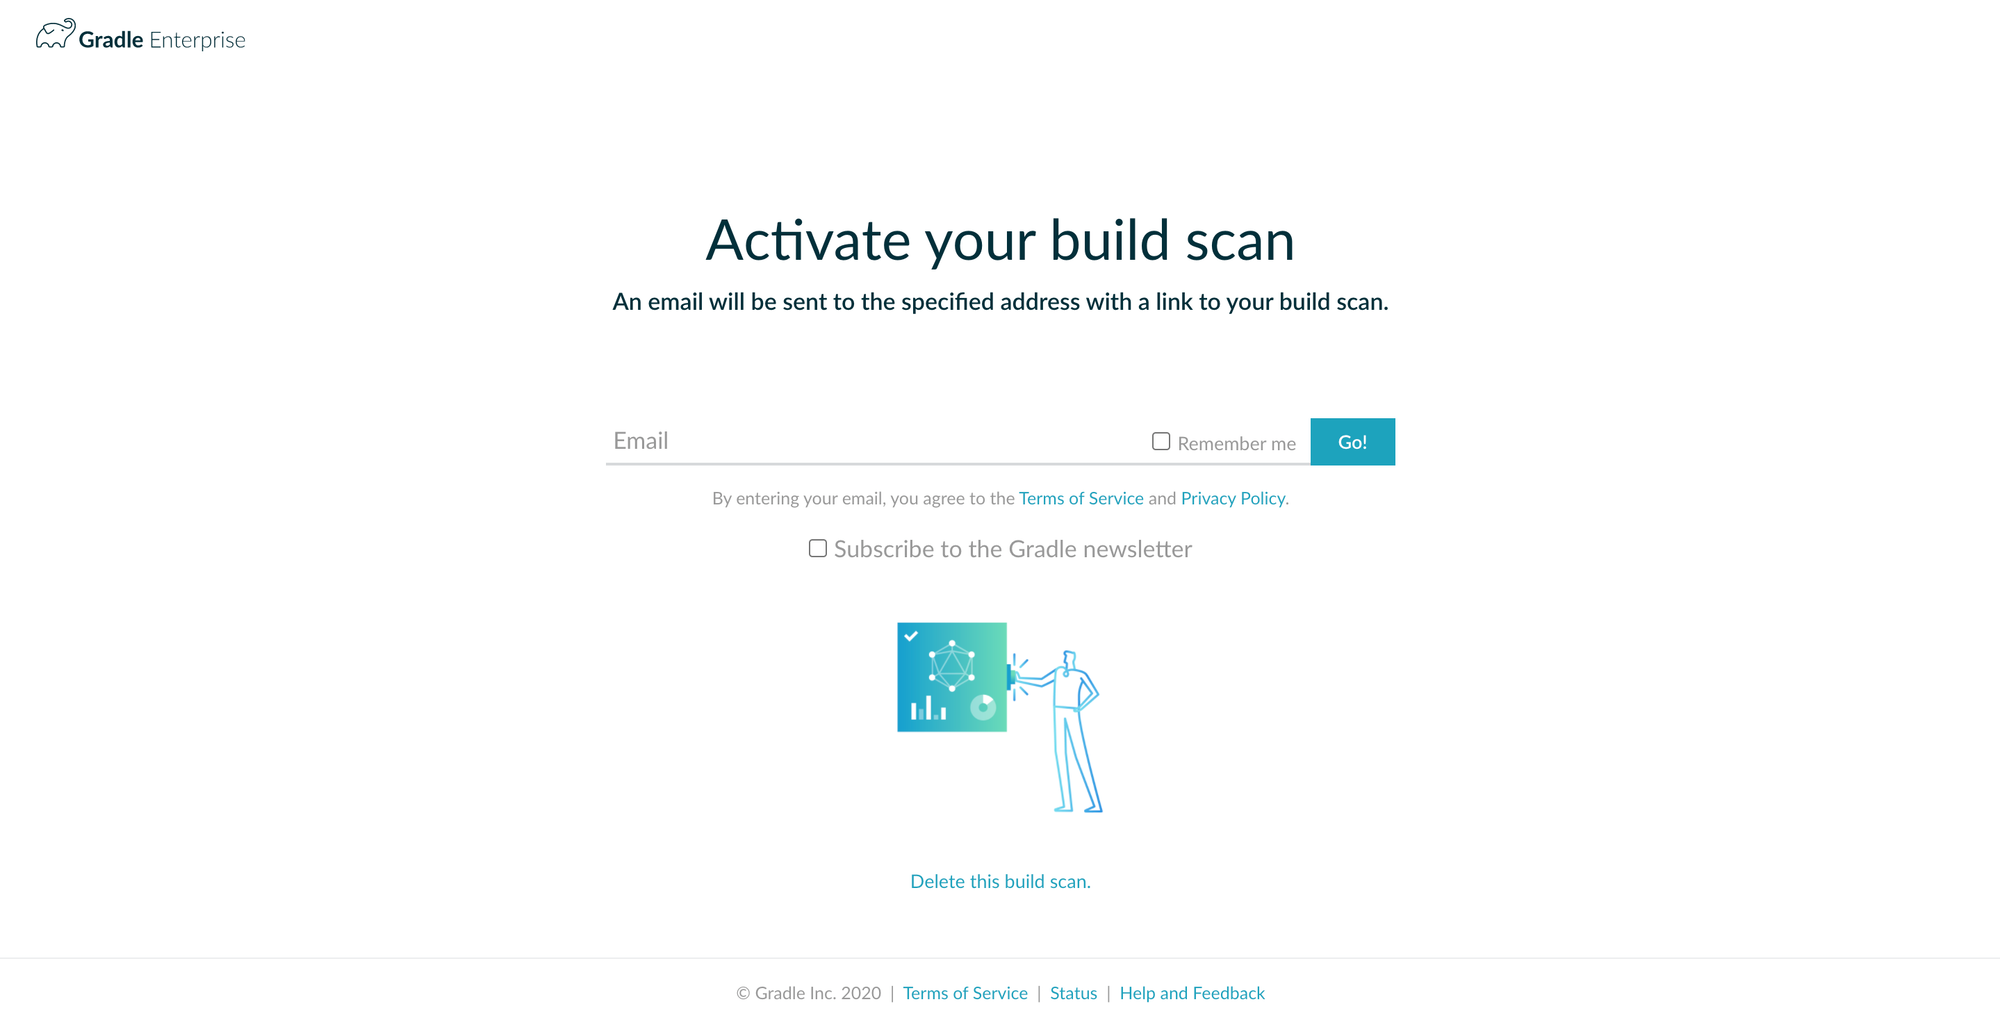 Activate Build Scan